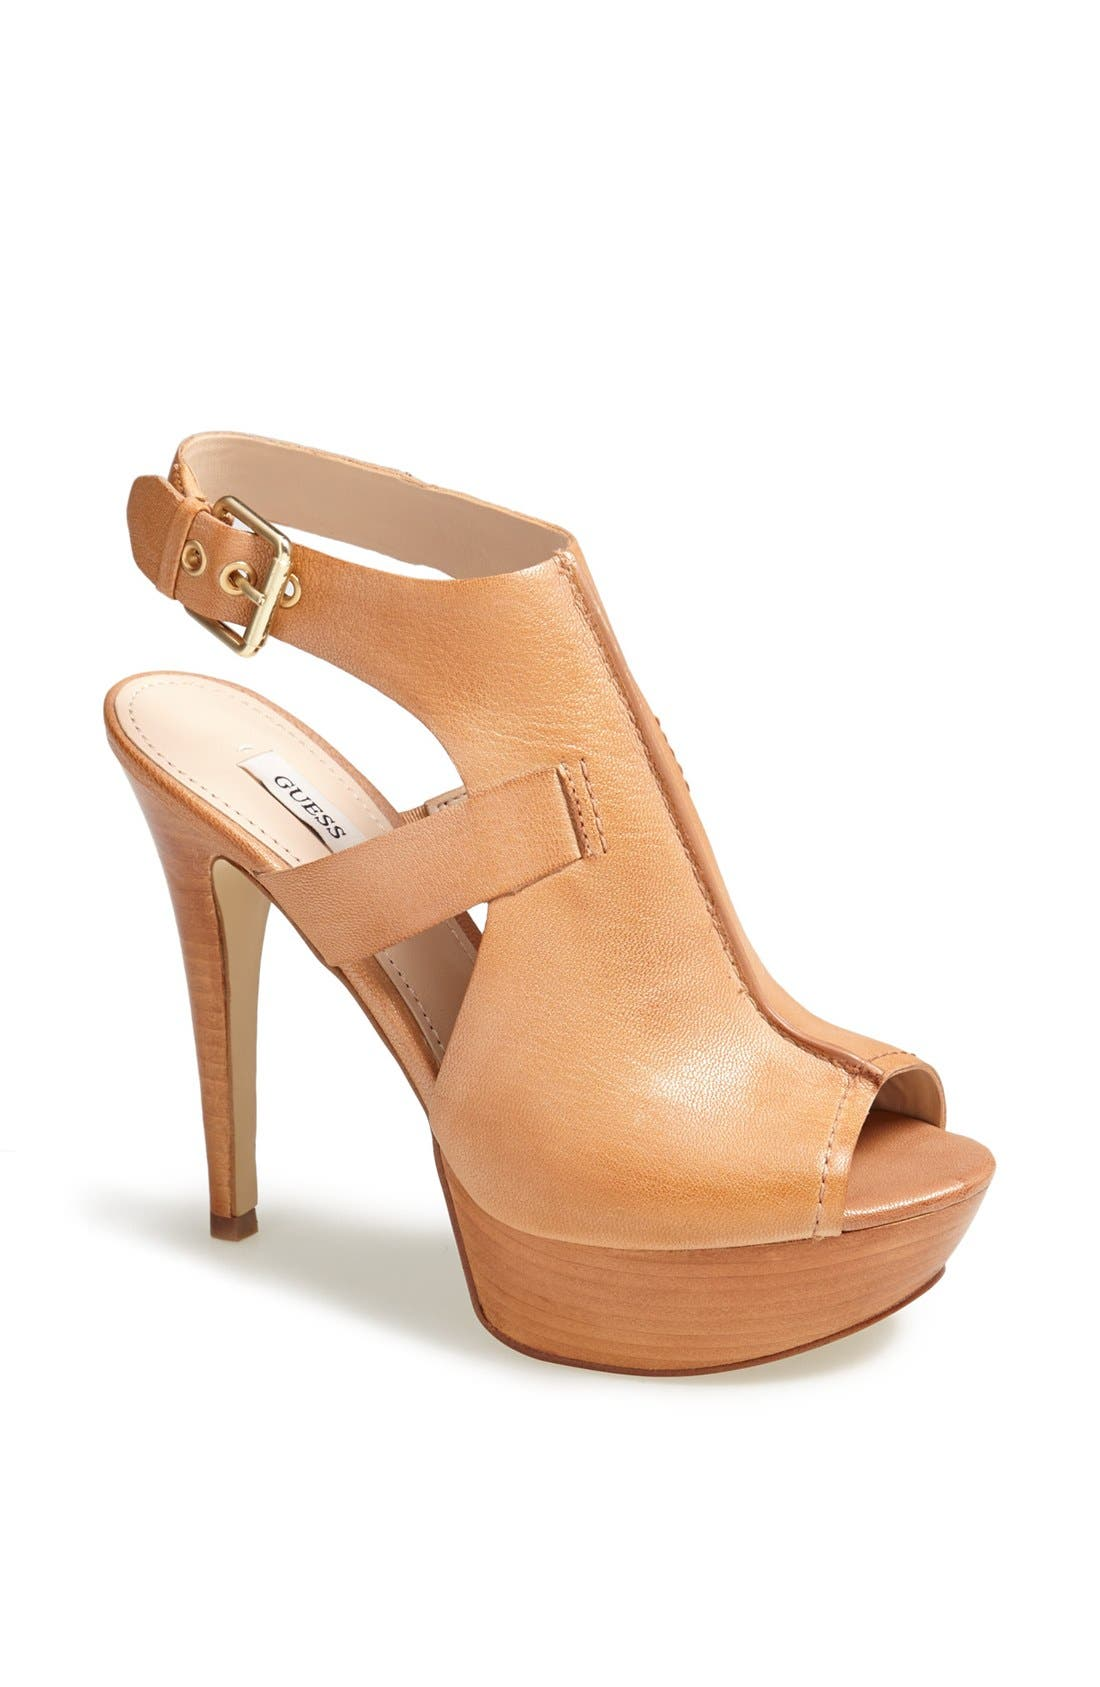 Main Image - GUESS 'Gwofira' Platform Sandal